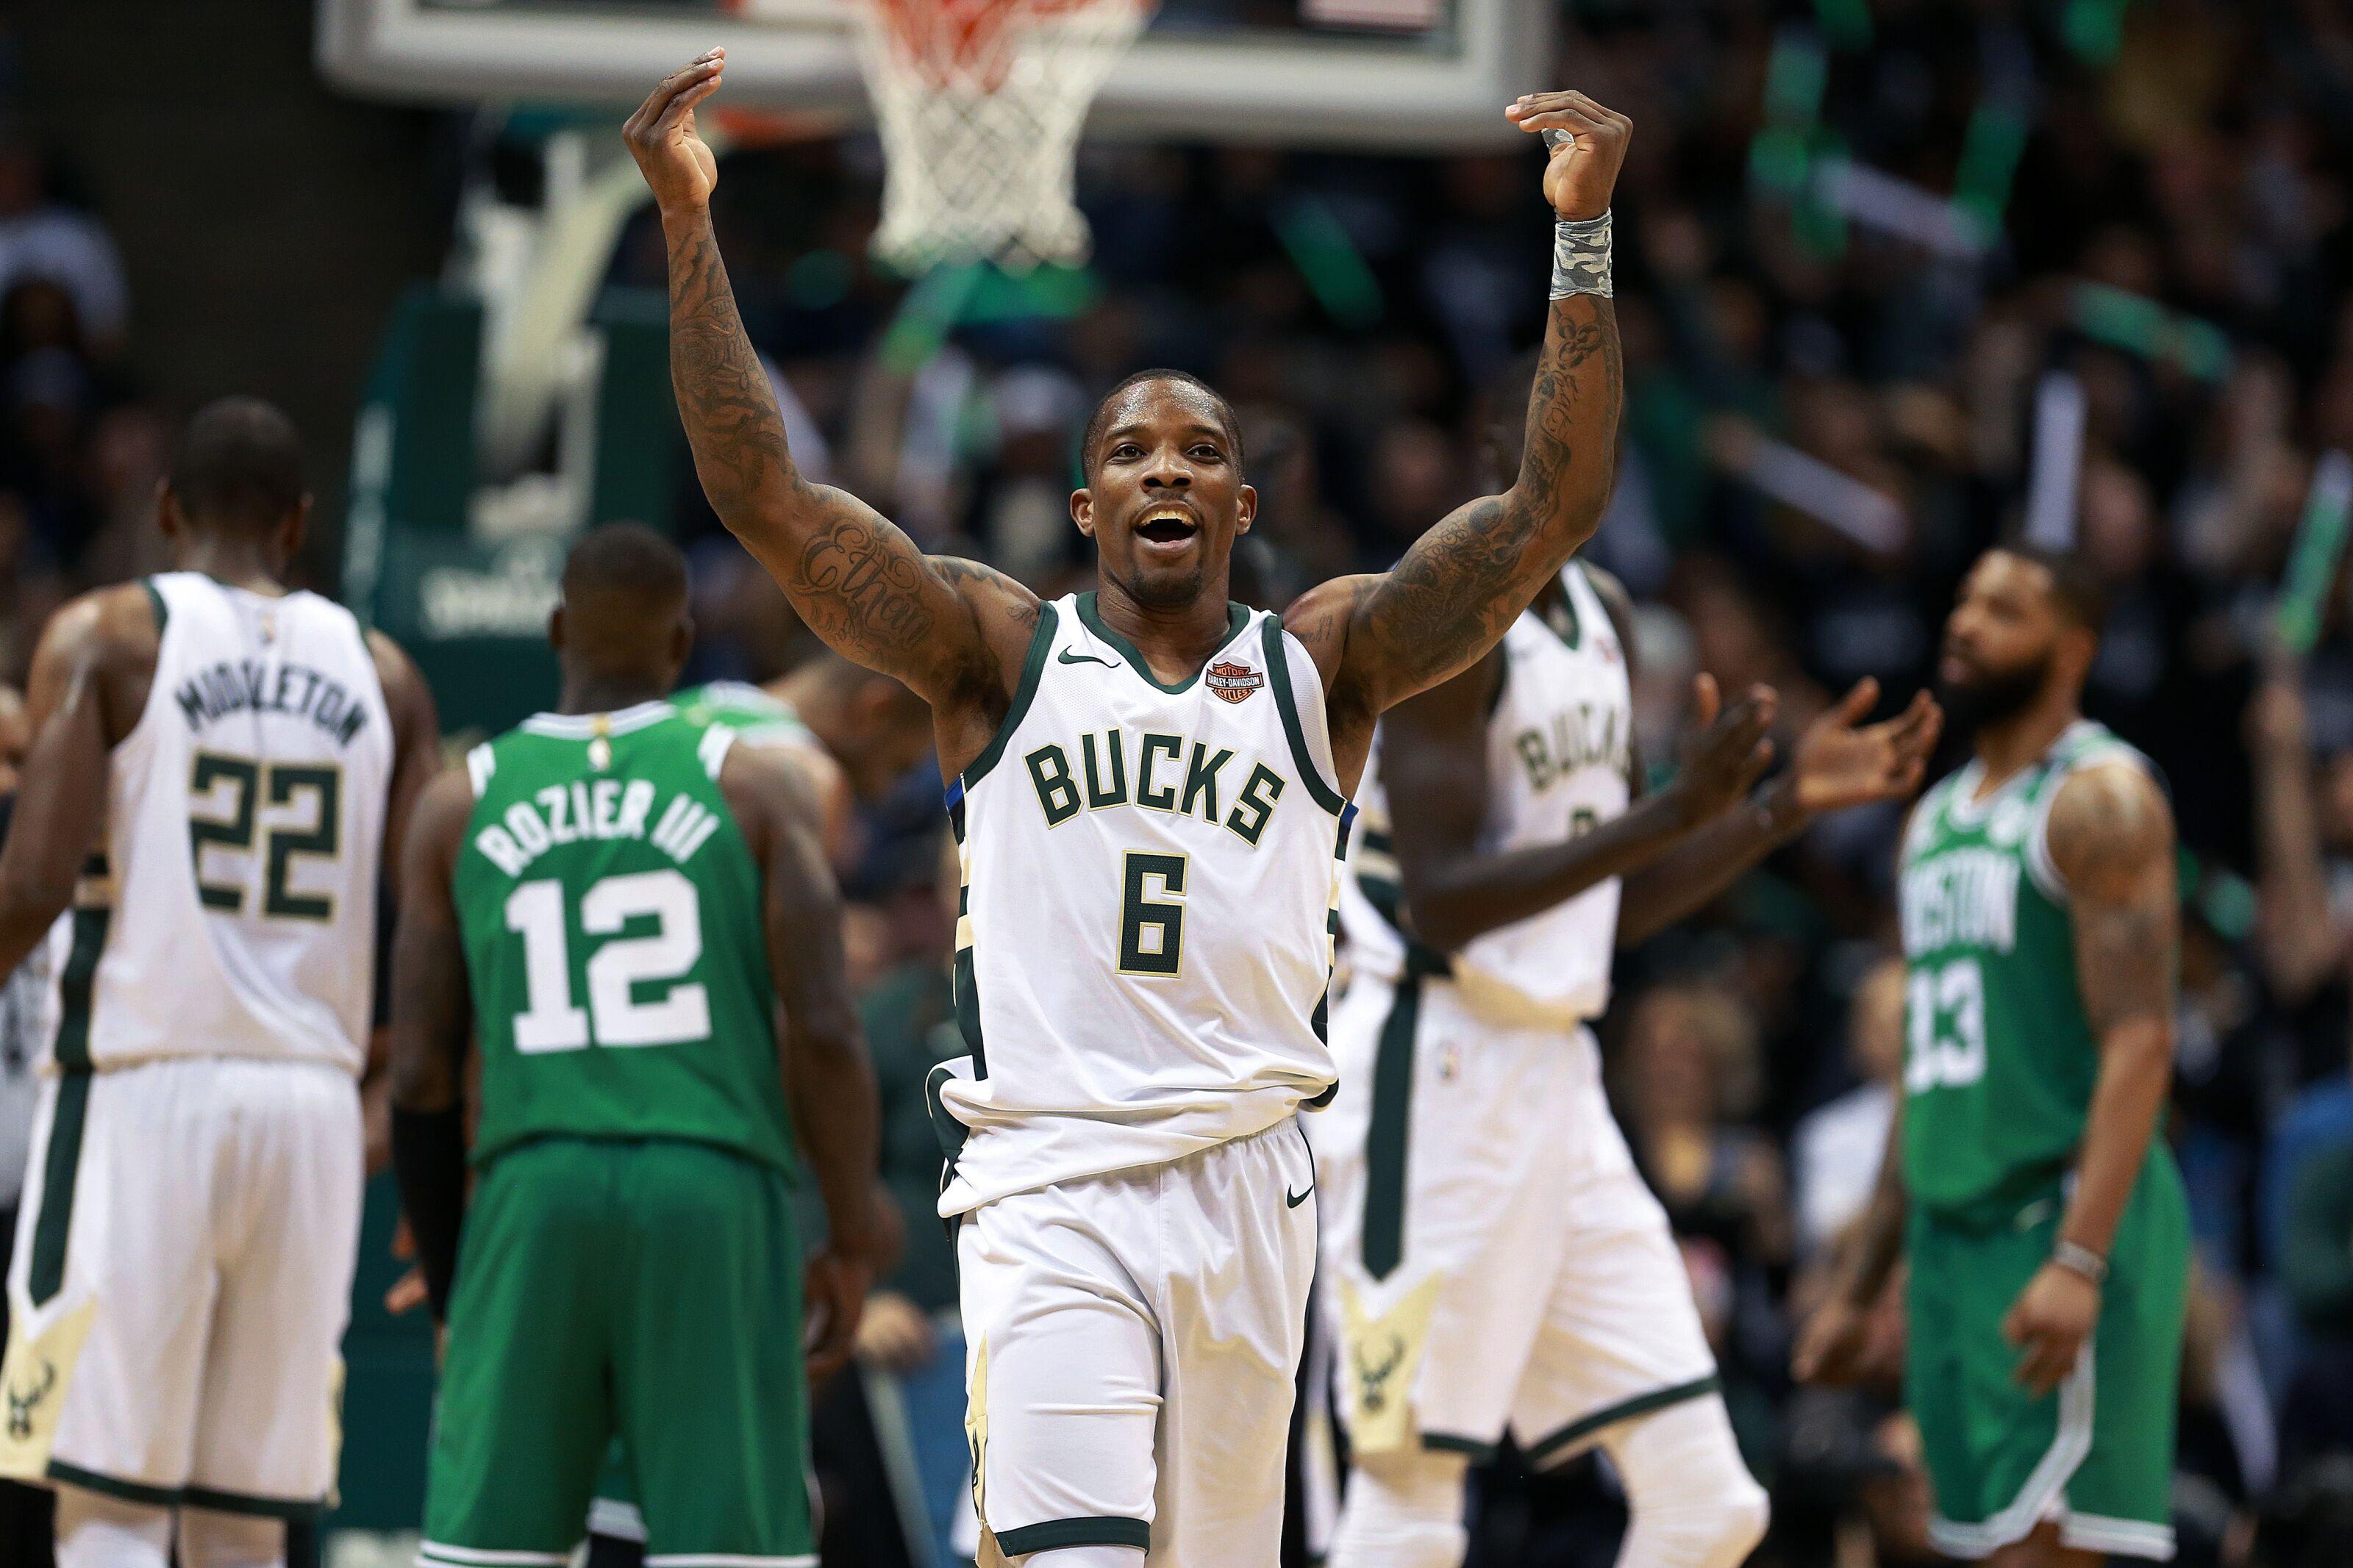 949300220-2018-nba-playoffs-boston-celtics-vs-milwaukee-bucks-at-bmo-harris-bradley-center.jpg